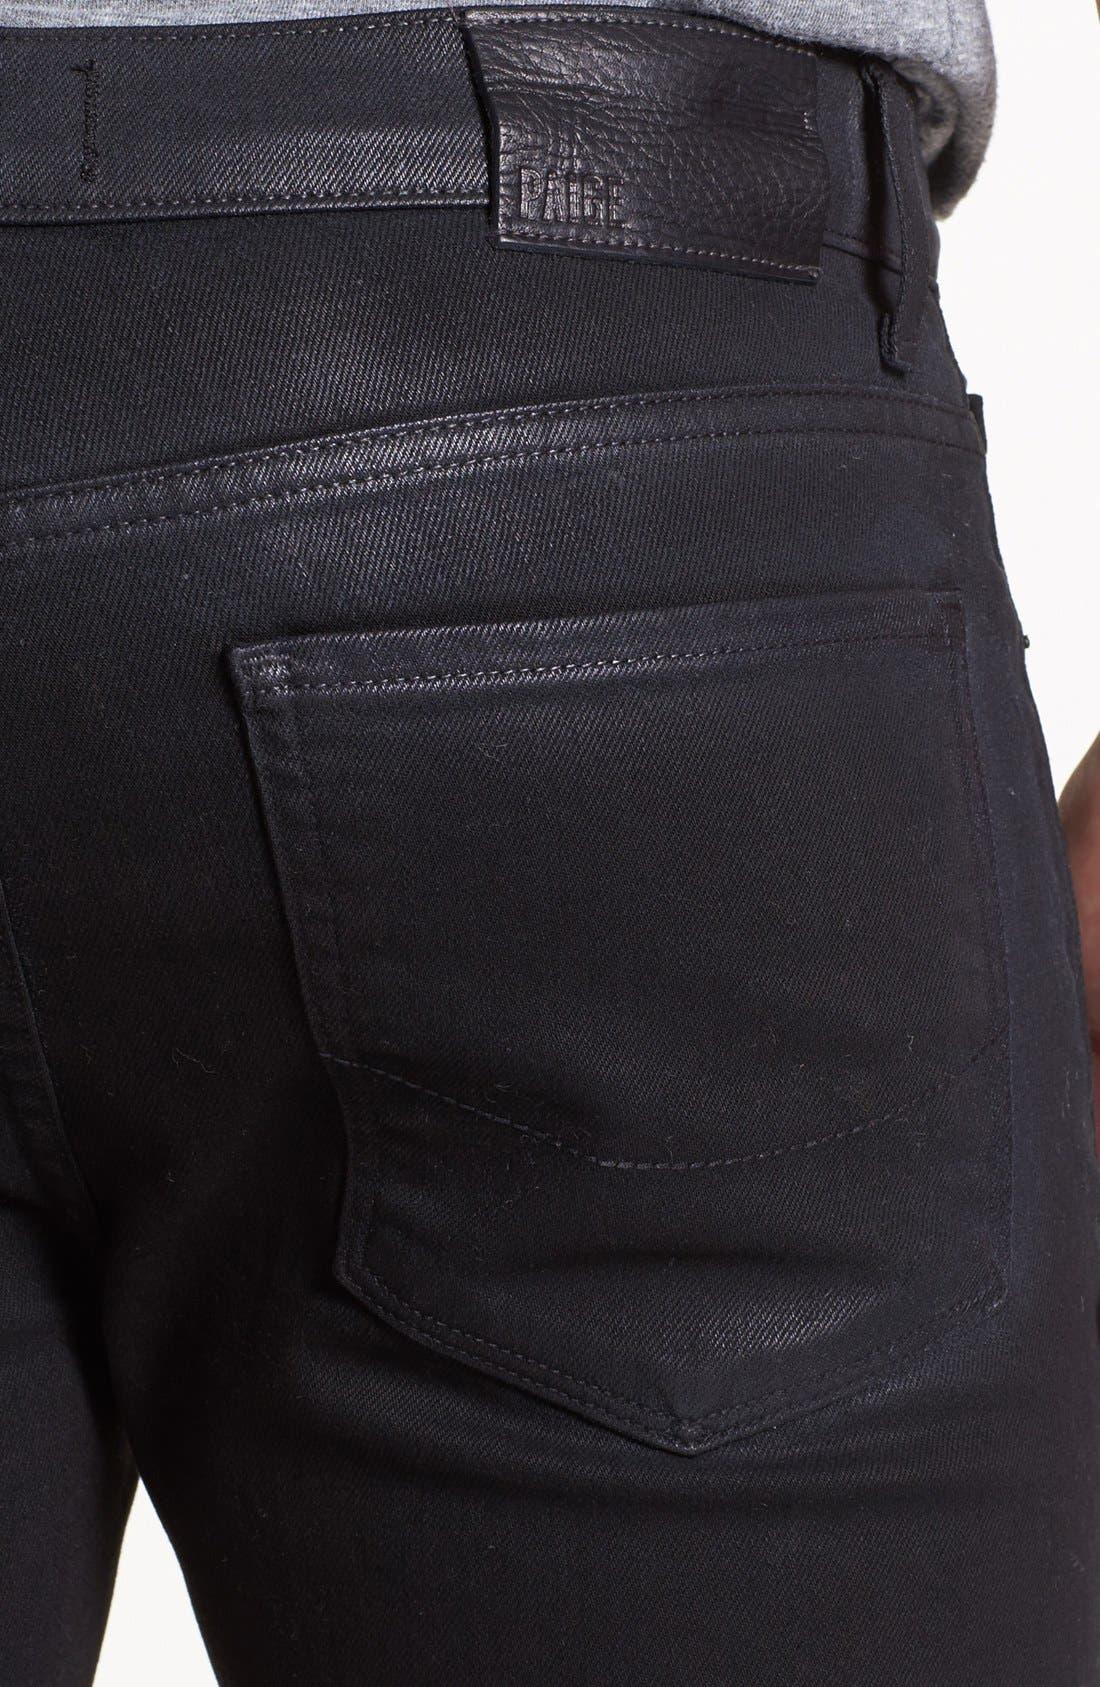 Alternate Image 4  - PAIGE 'Federal' Coated Slim Fit Jeans (Oil Slick)